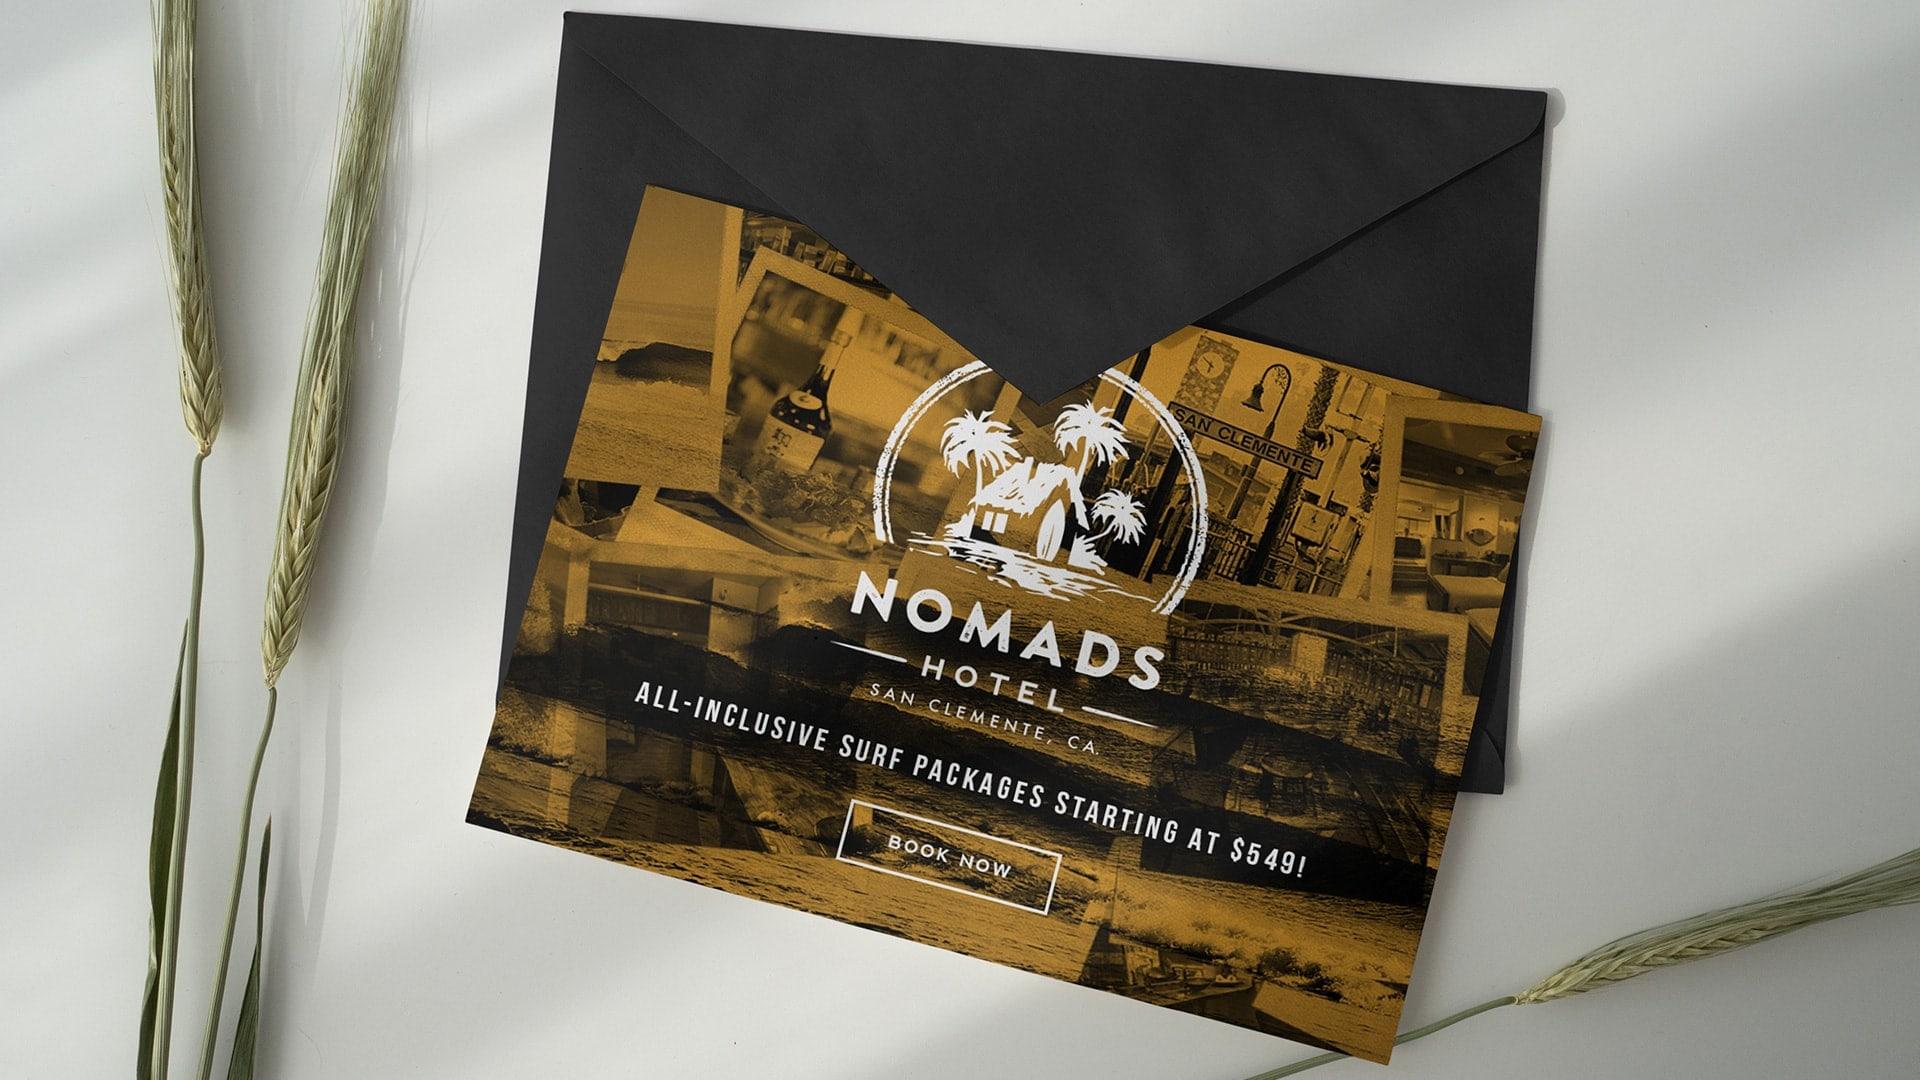 Nomads Hotel Postcard - Unsung Studio Branding